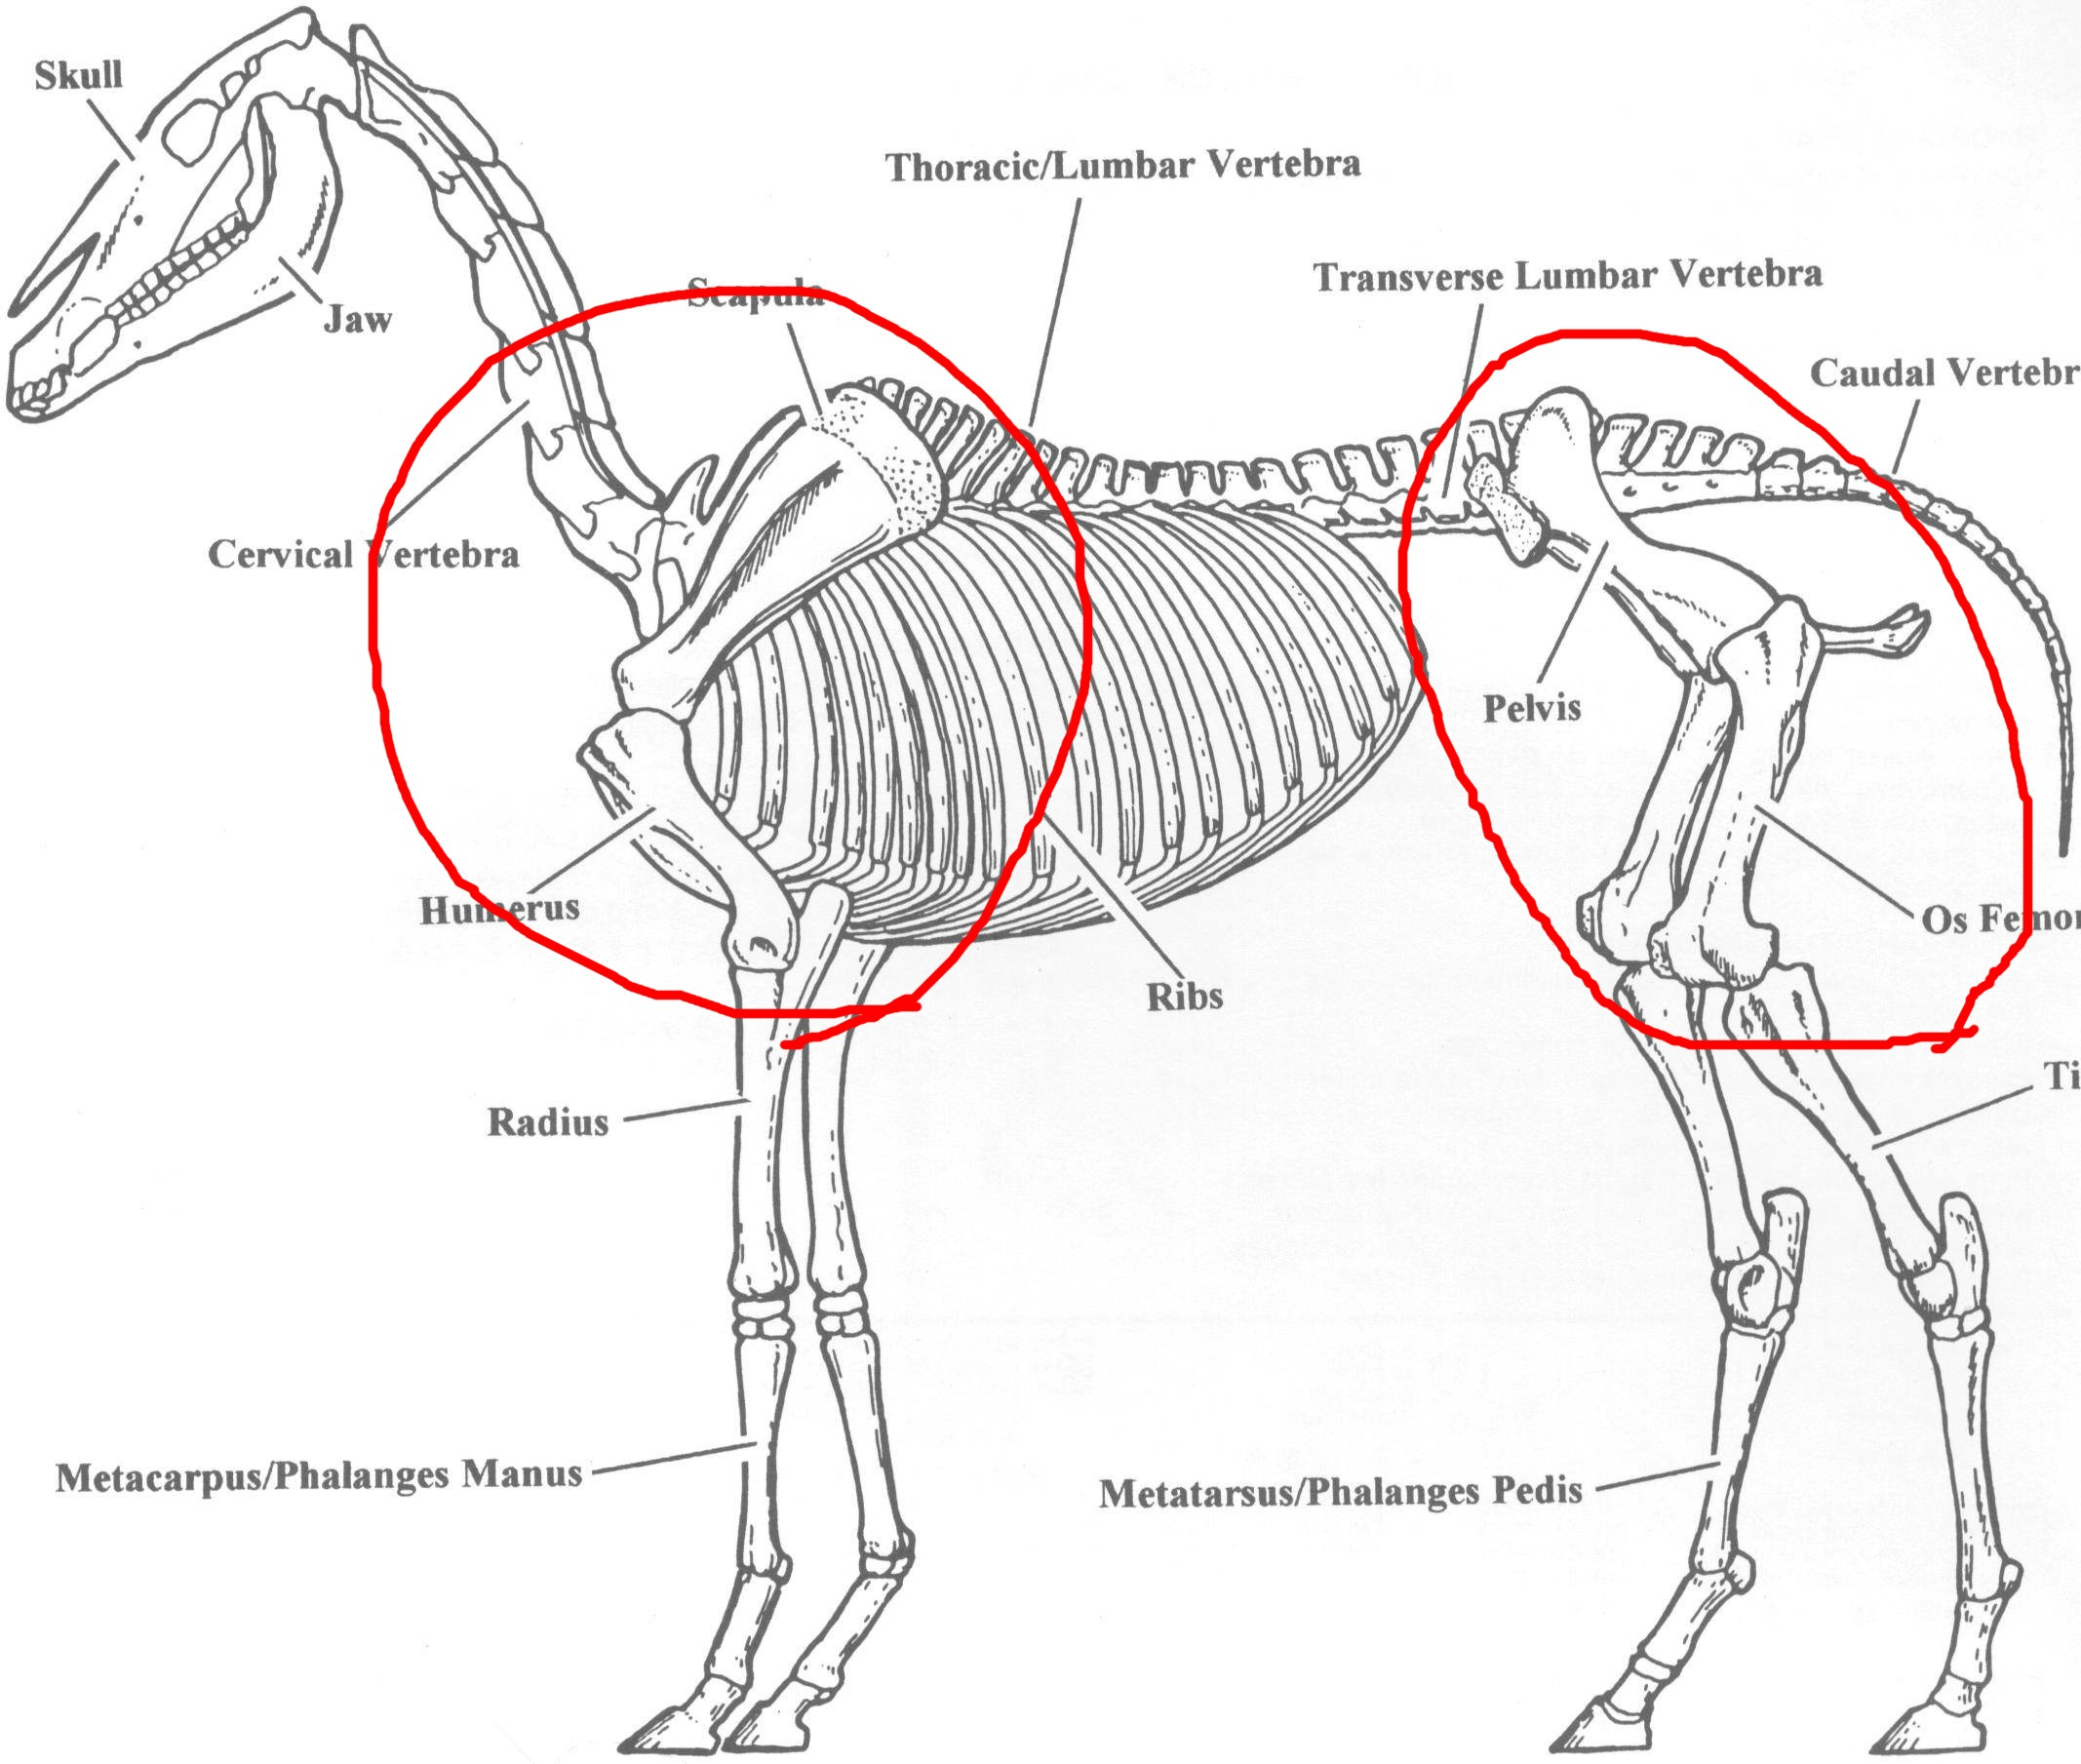 Großzügig Pferd Hinteres Bein Anatomie Ideen - Anatomie Ideen ...